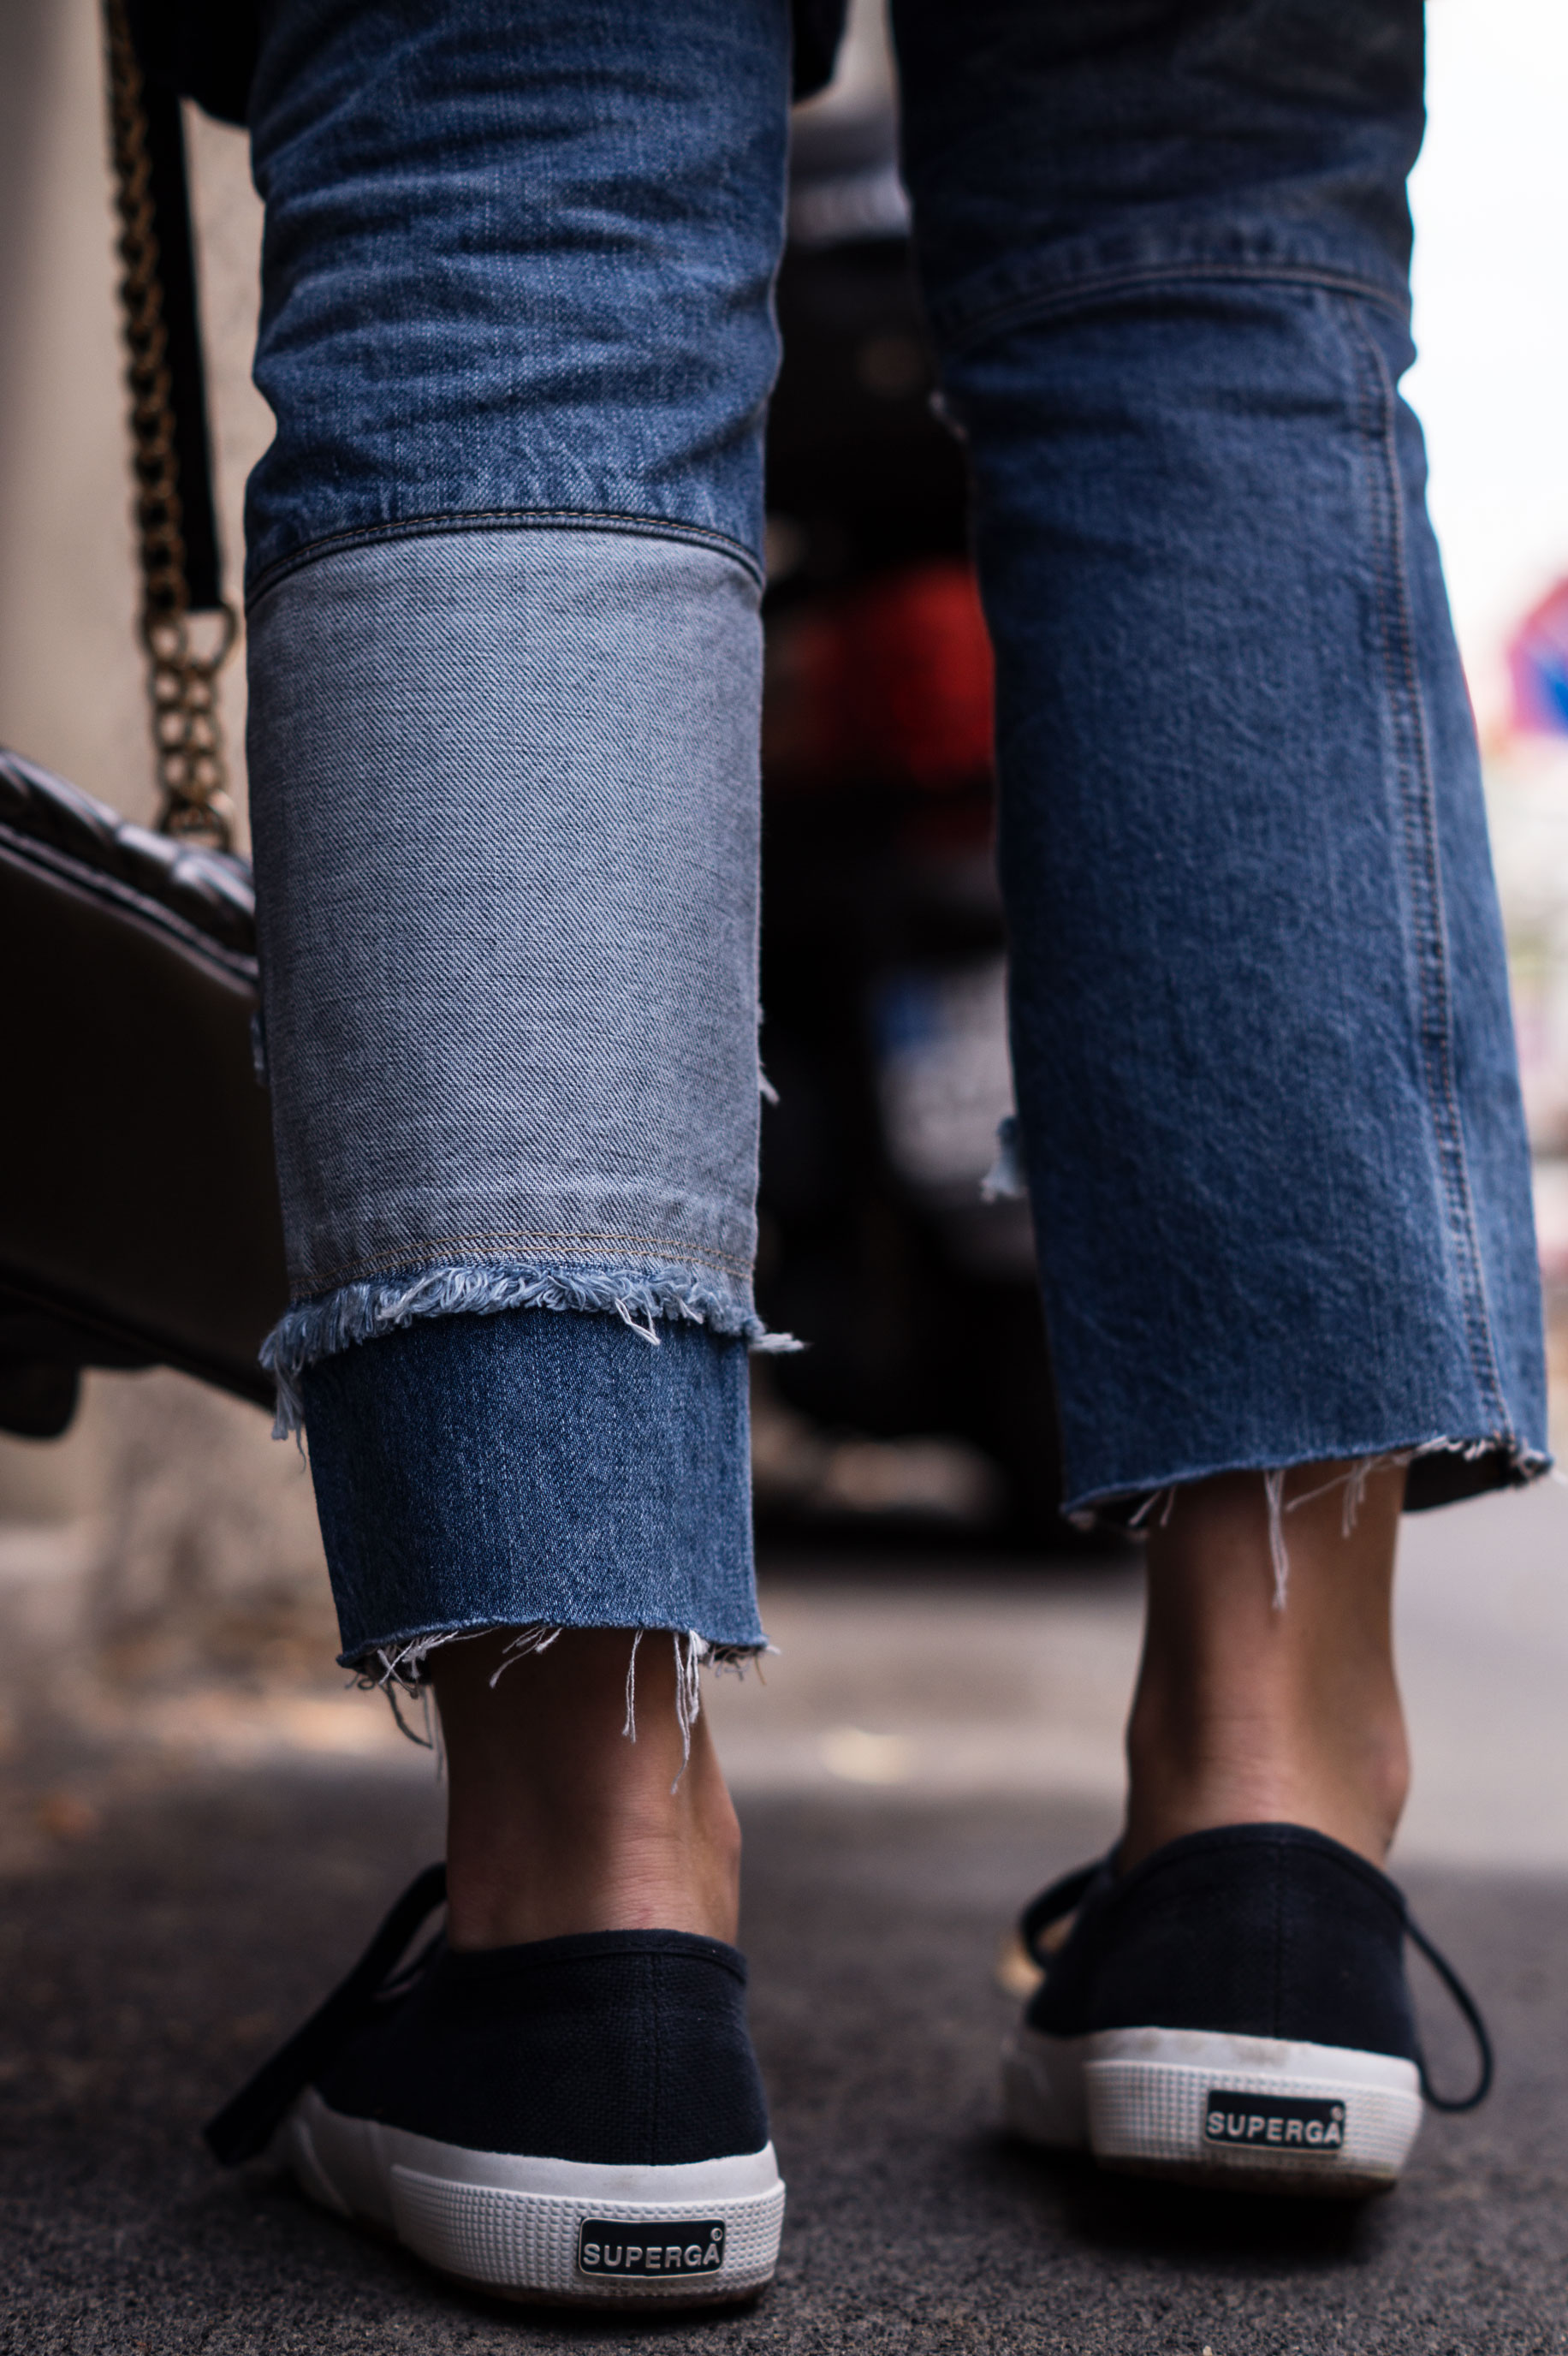 Patched Boyfriend Jeans Denim Bomberjacke Superga navy blau blue in blue Streetstyl Milan Mailand Sariety Fashionblogger Modeblog-19